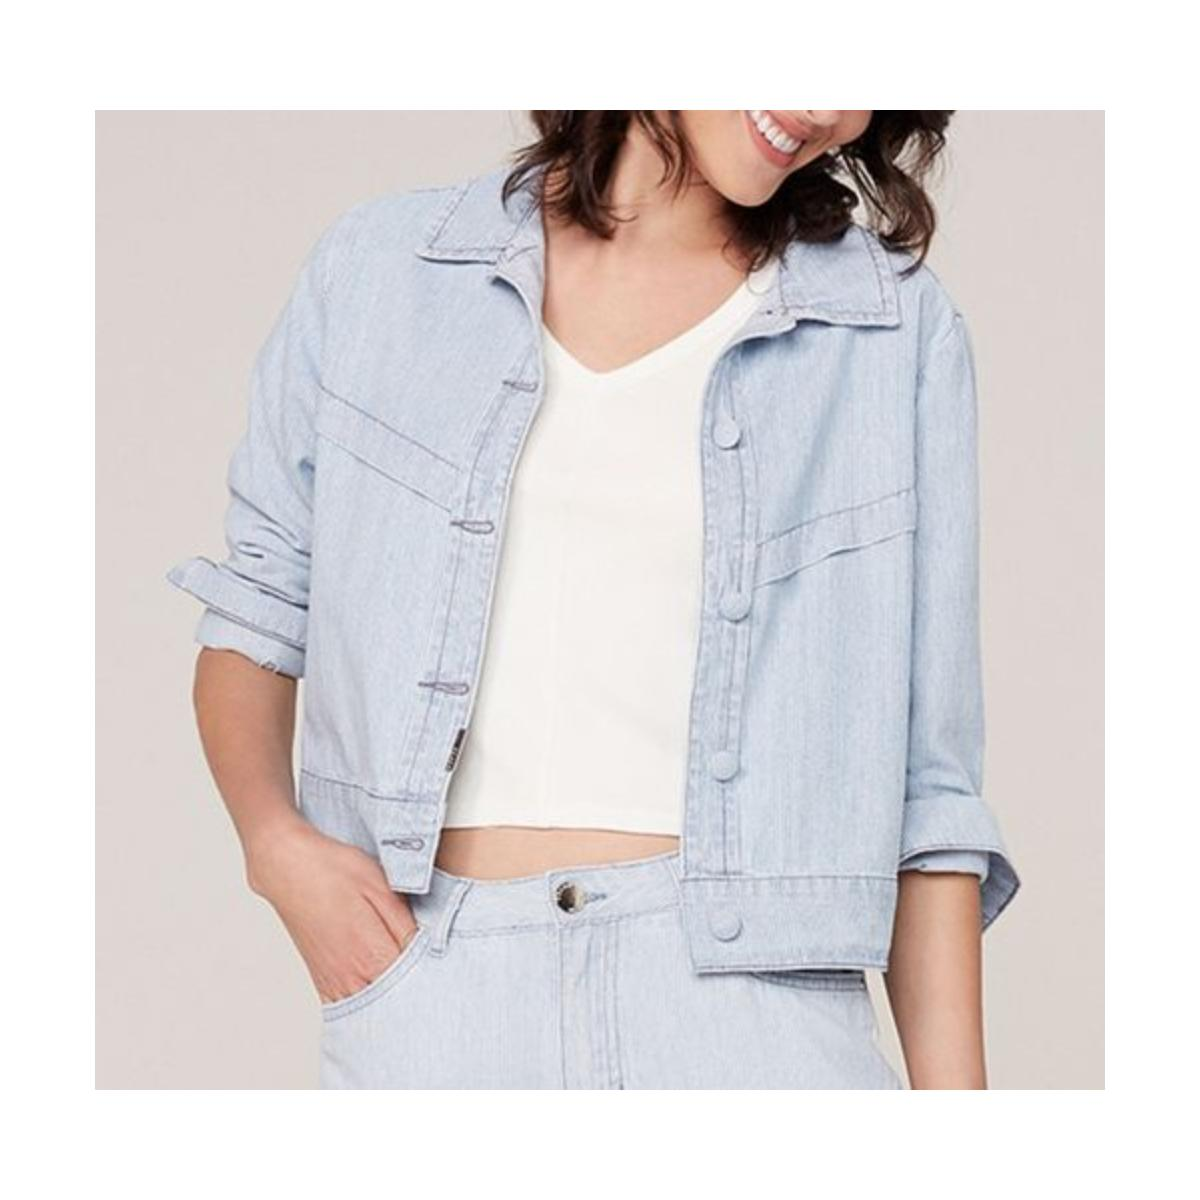 Jaqueta Feminina Dzarm Z8k3 1asn  Jeans